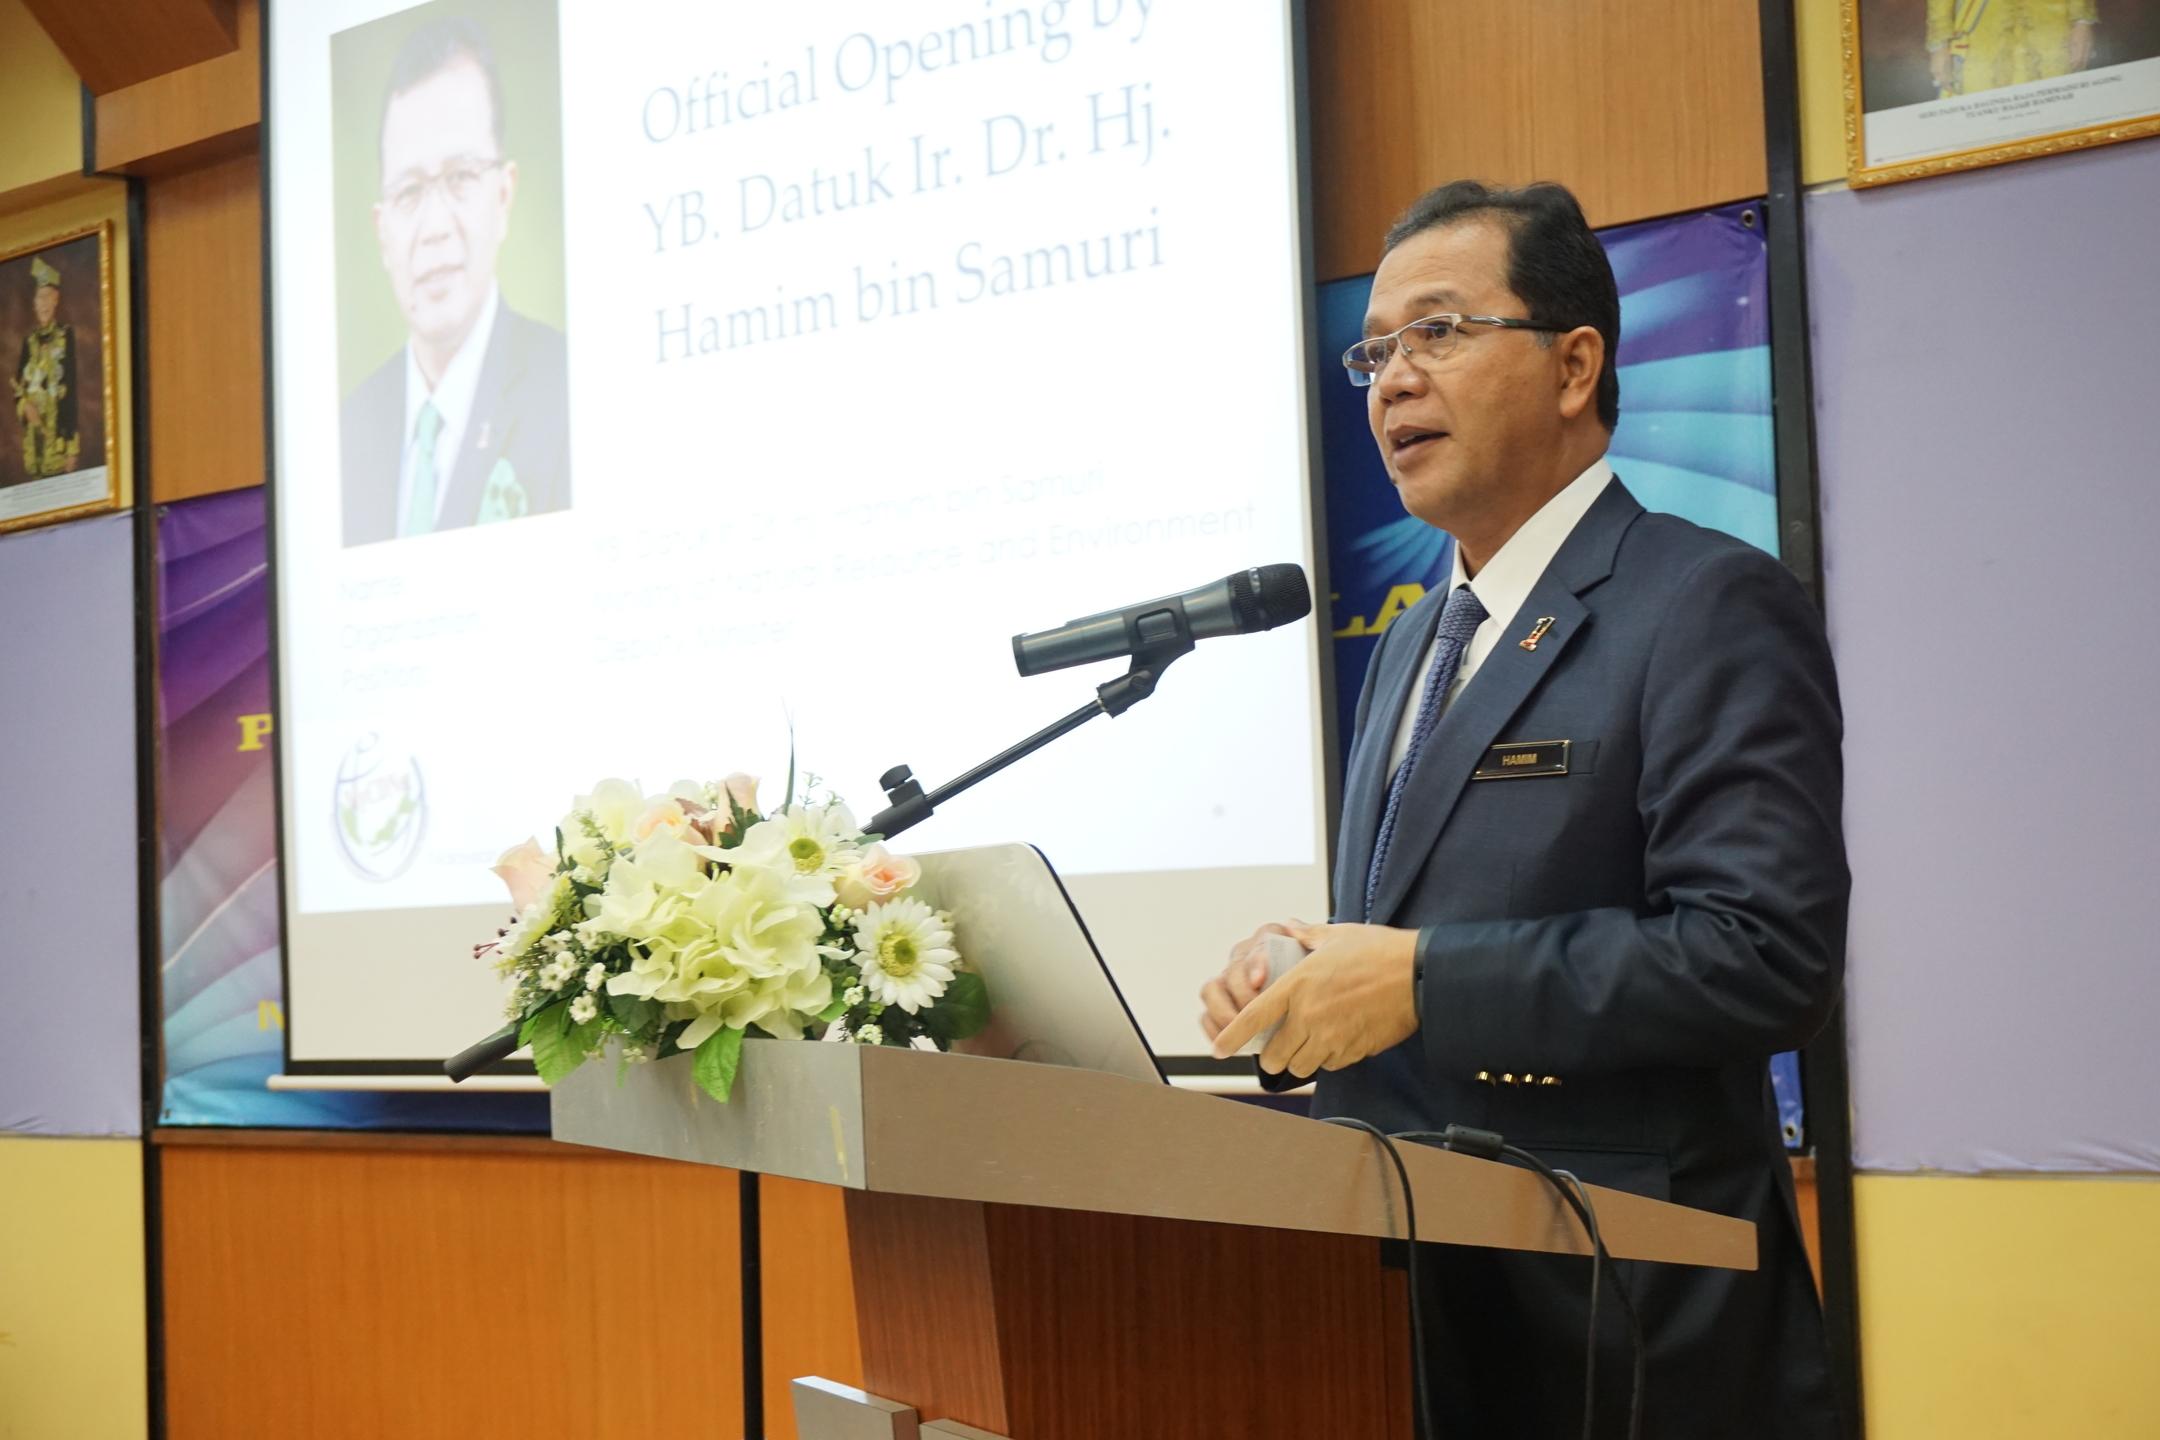 Official Opening by YB Datuk Ir Dr Hj Hamim bin Samuri